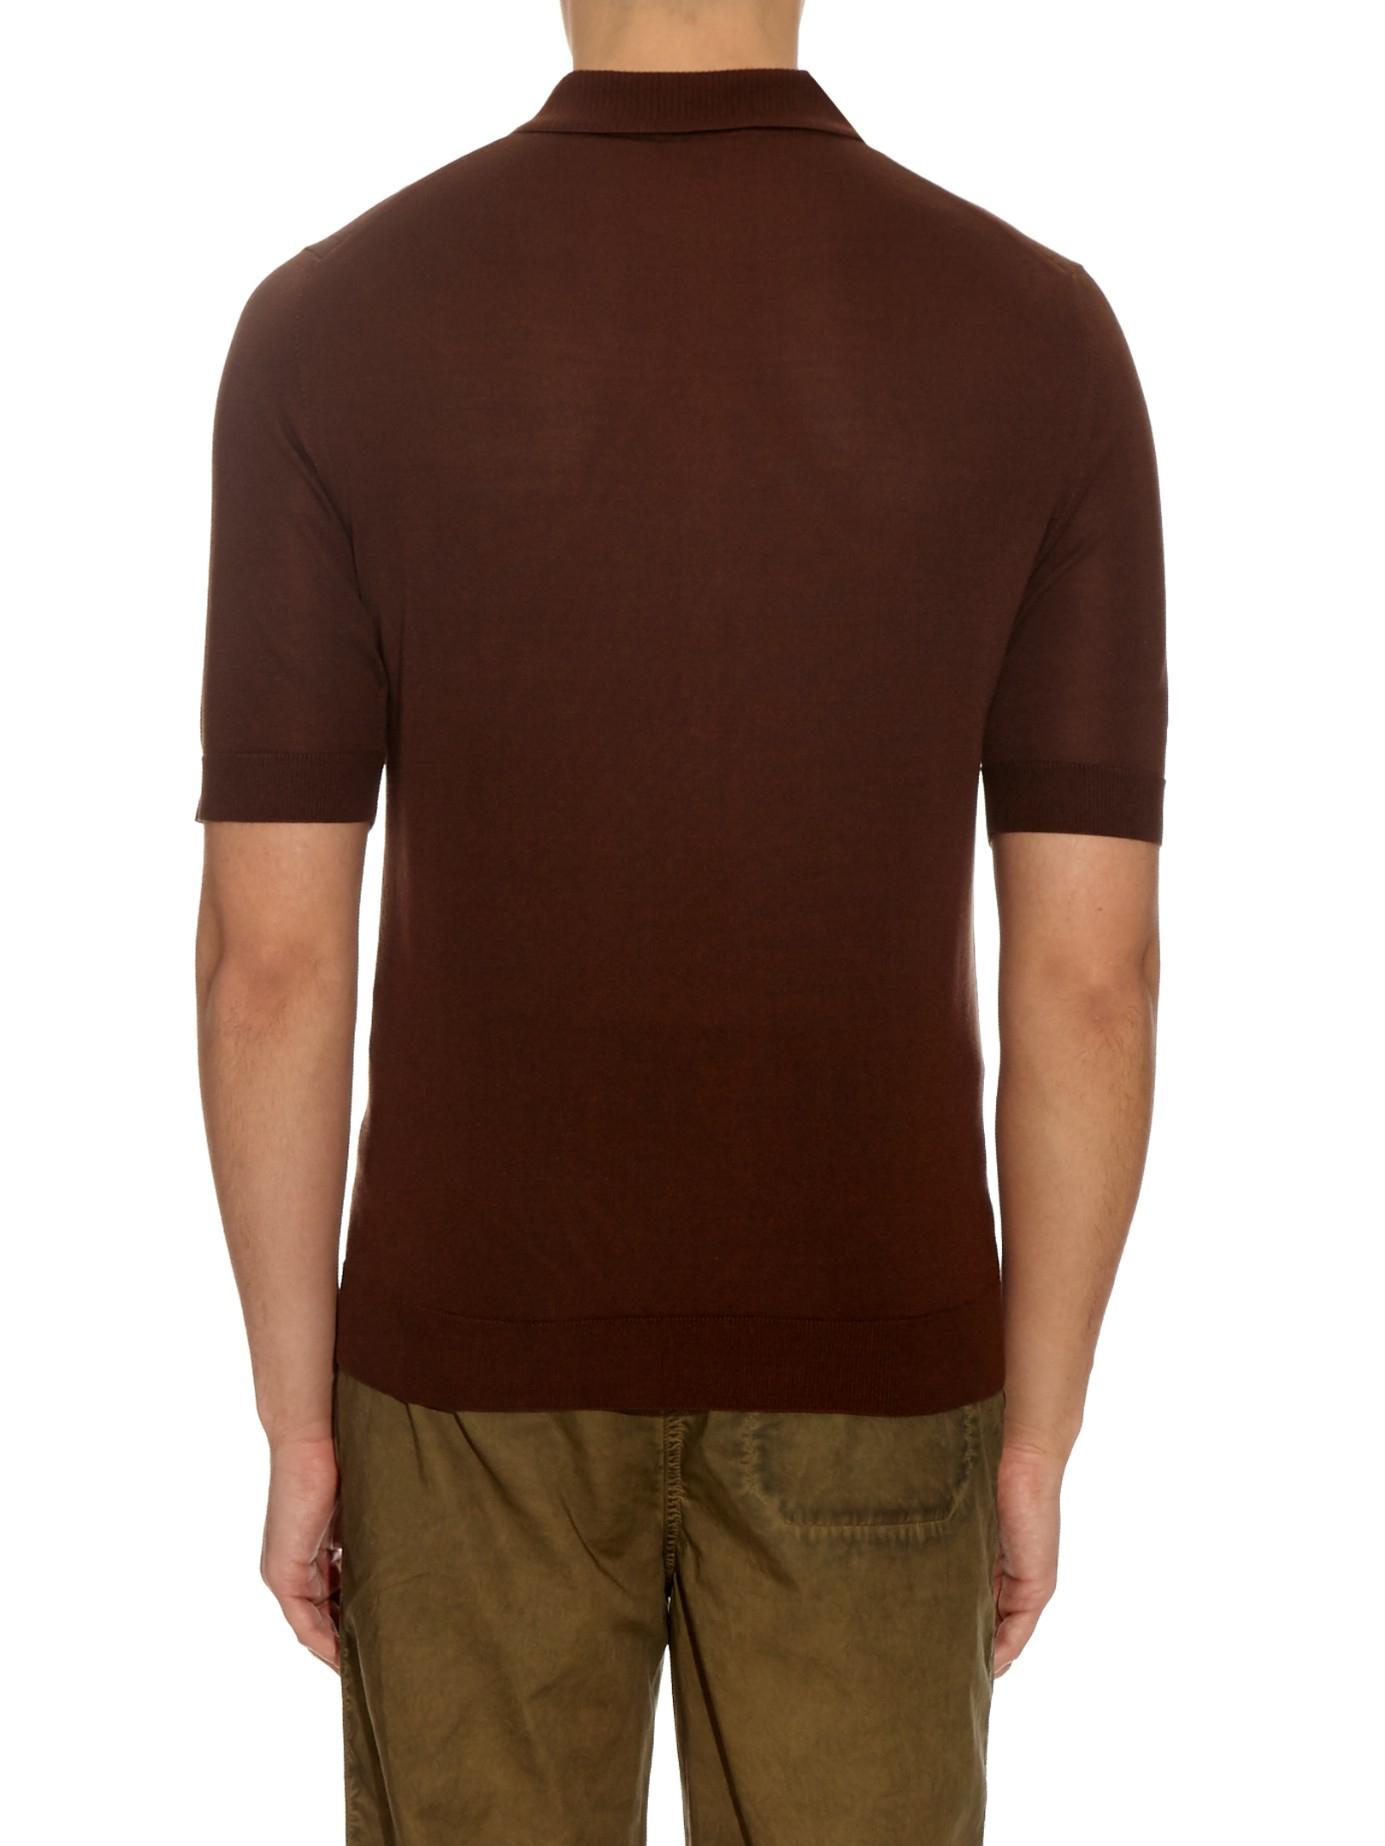 Burberry Prorsum Short Sleeved Silk Knit Polo Shirt In